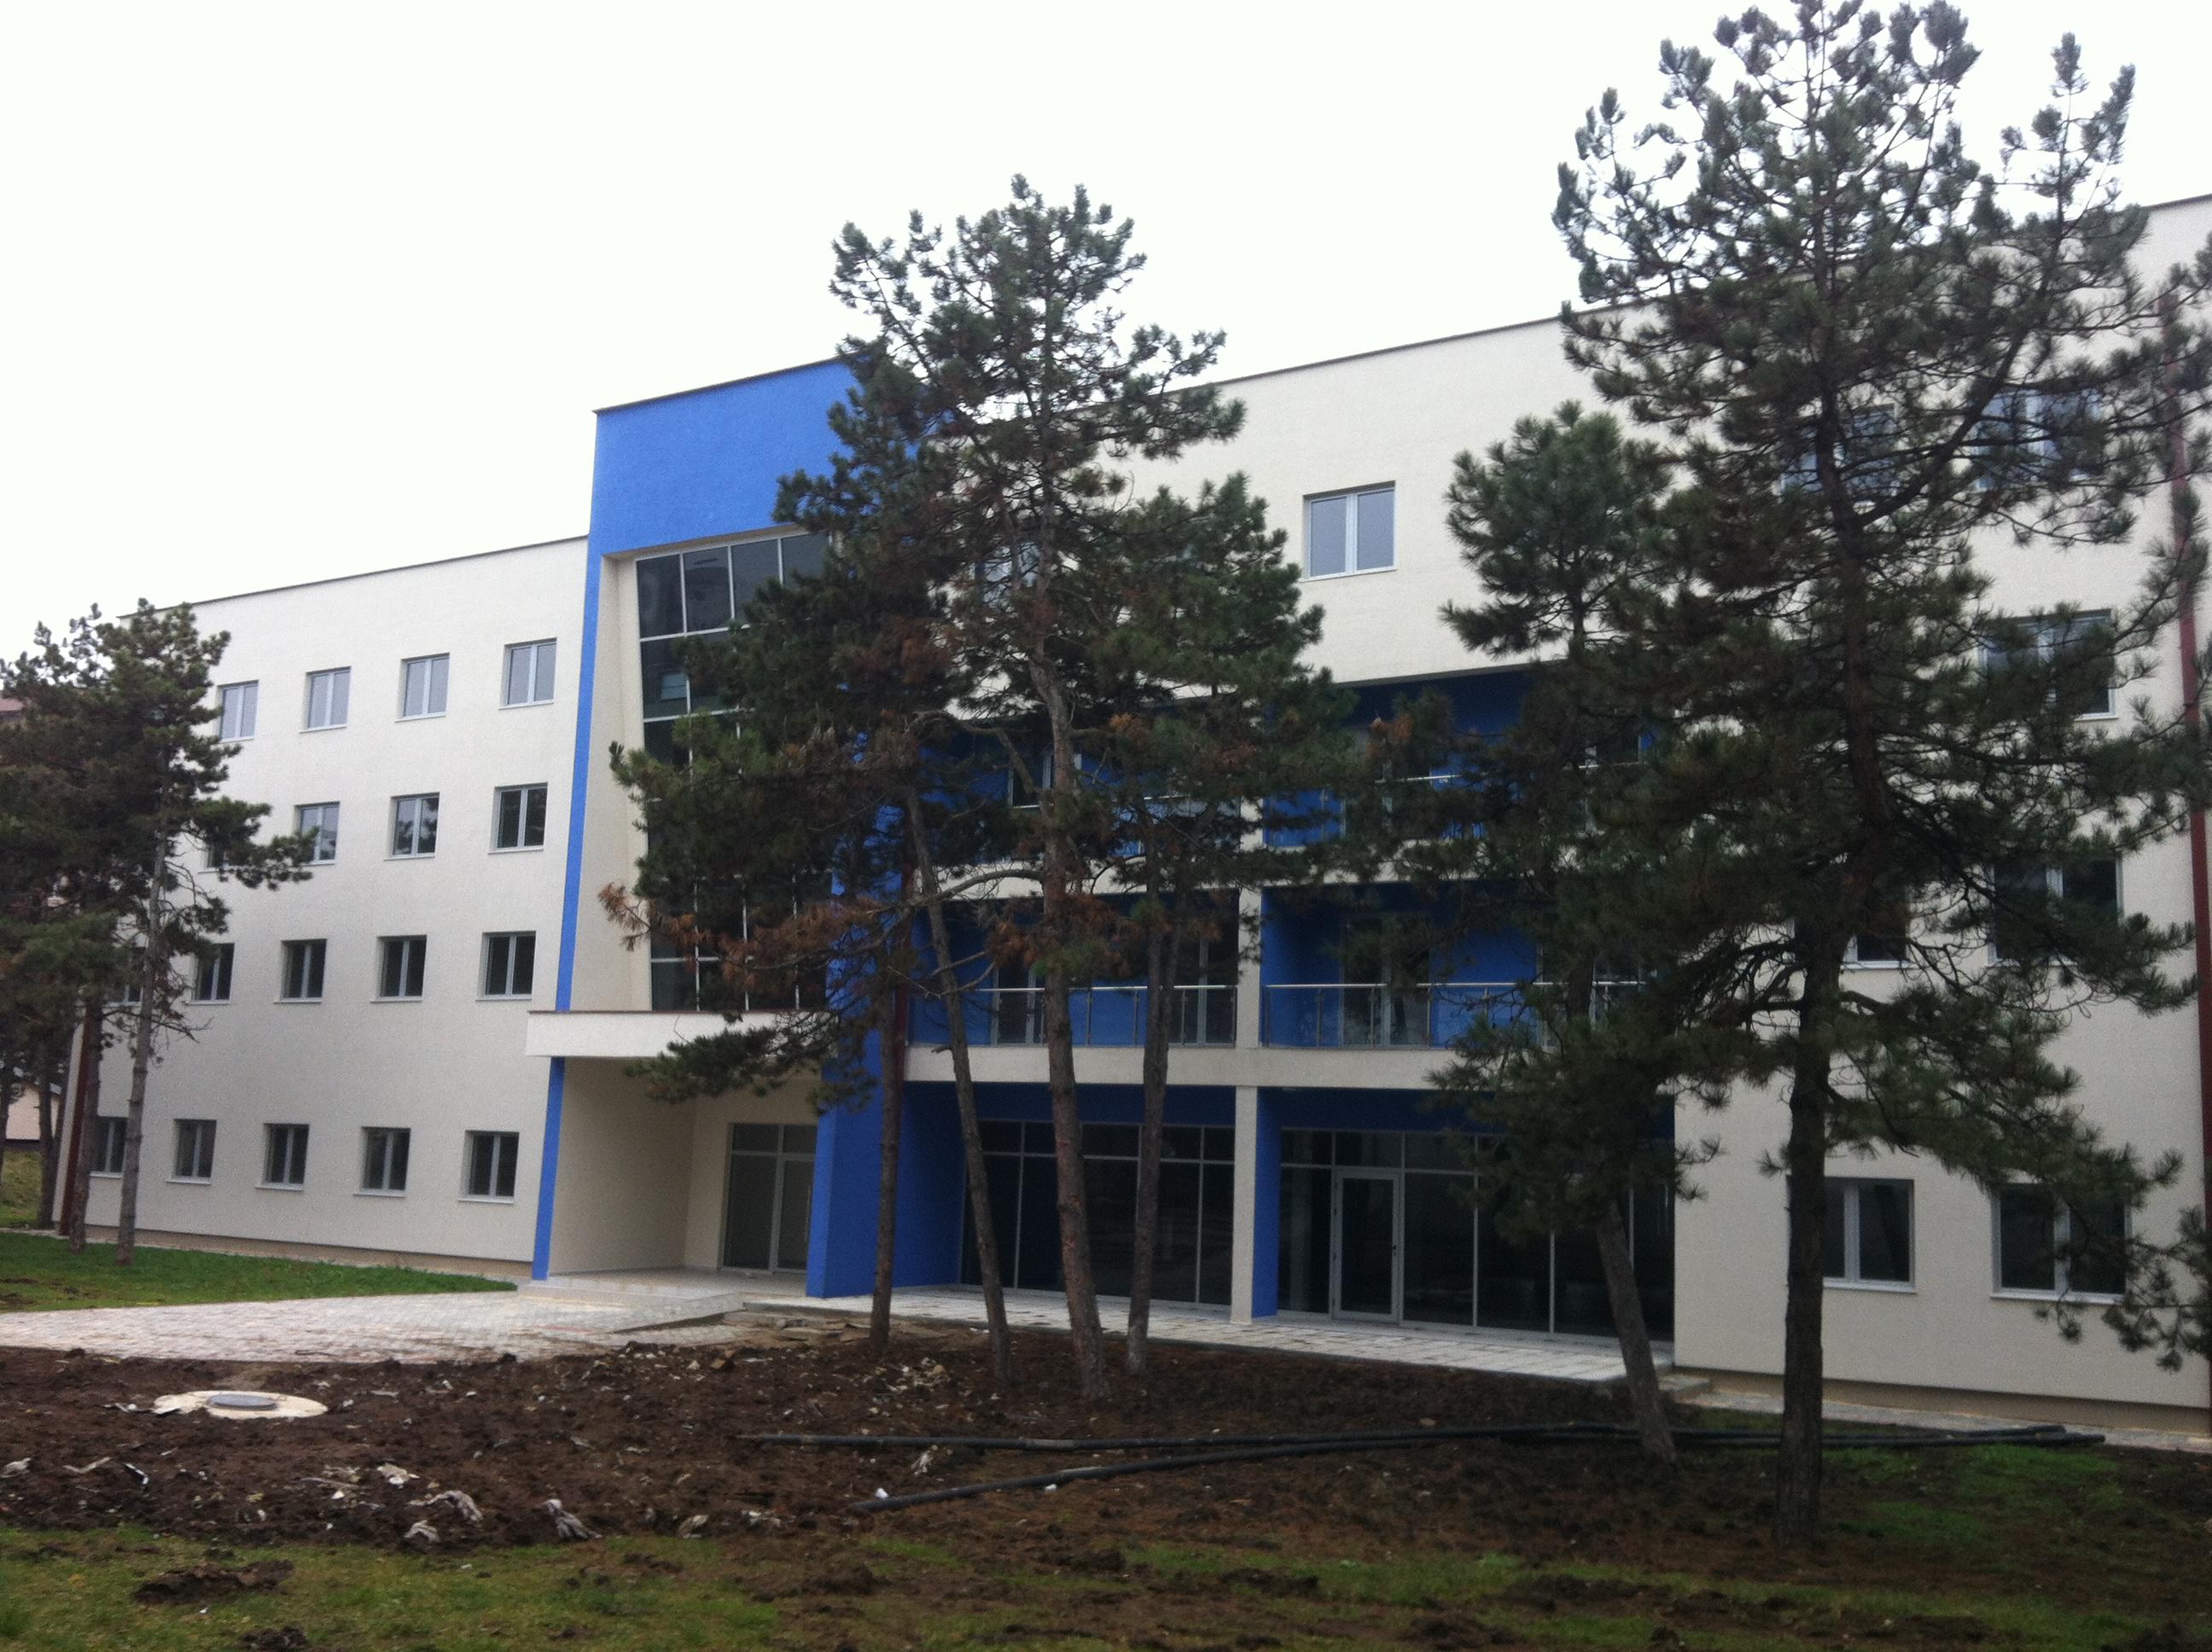 Construction of a New Dormitory (KAPS Senior Class Student Dormitory)